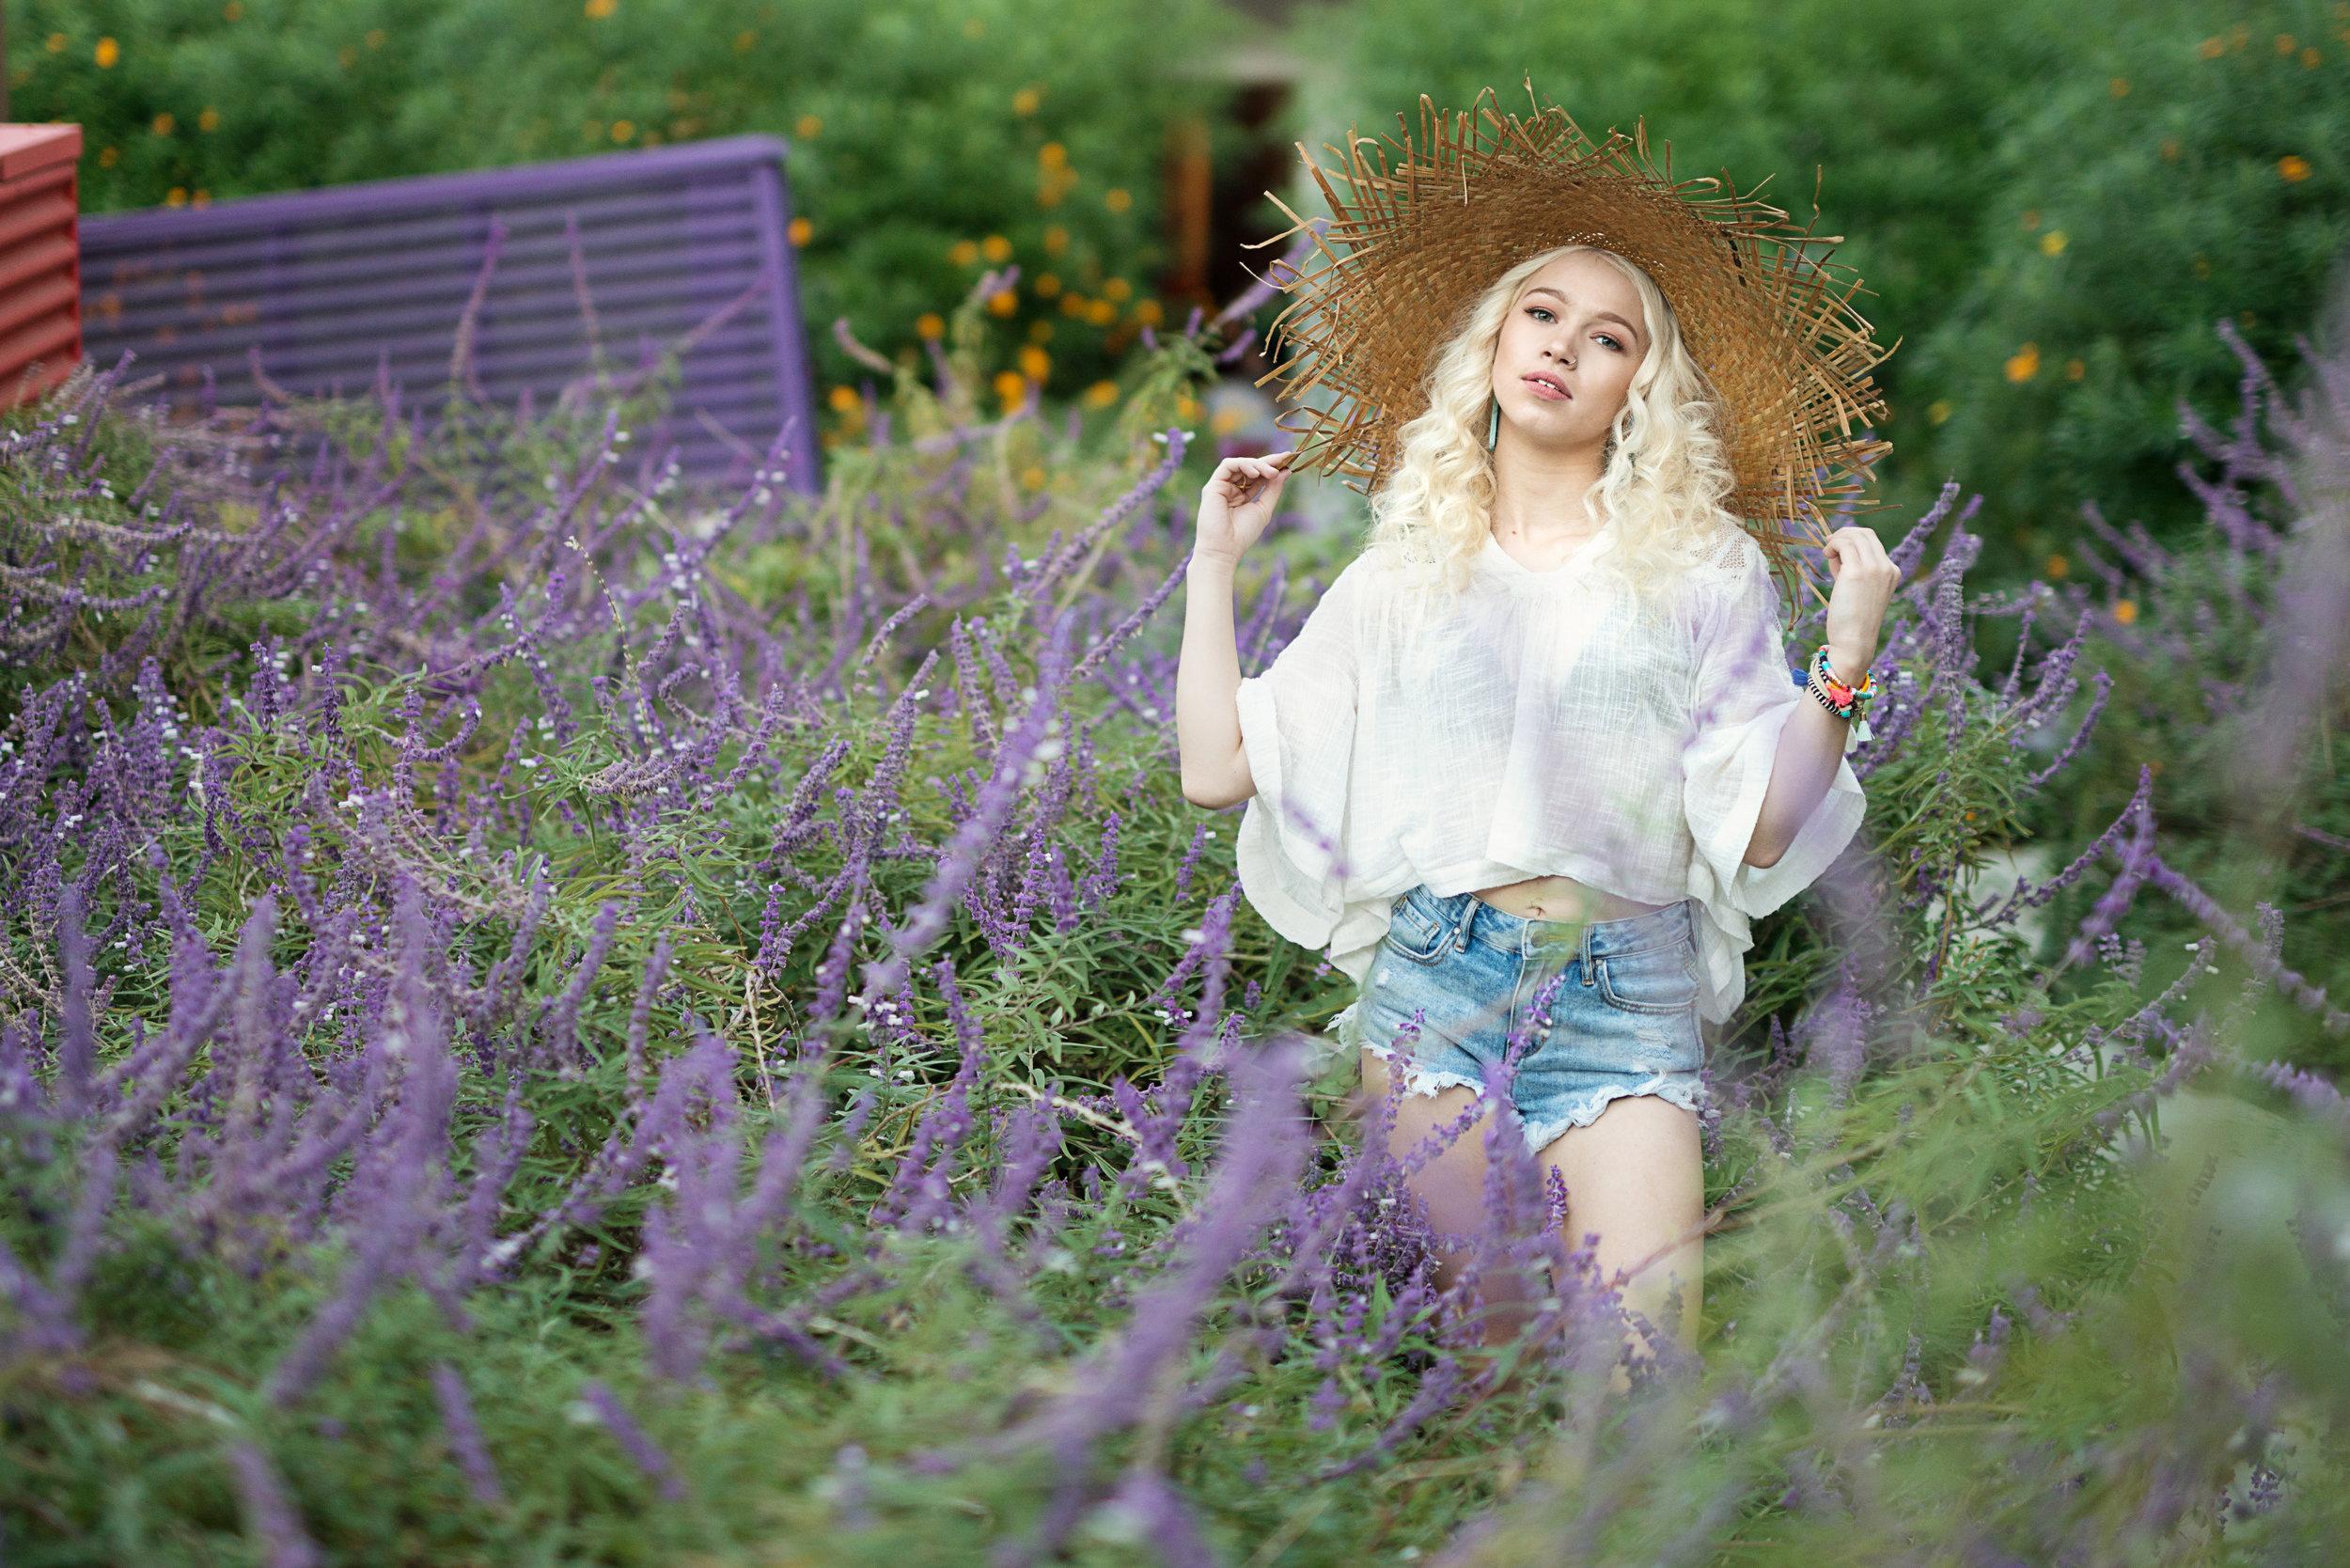 Tawny - Blink 2016 - Amanda Holloway 02.jpg